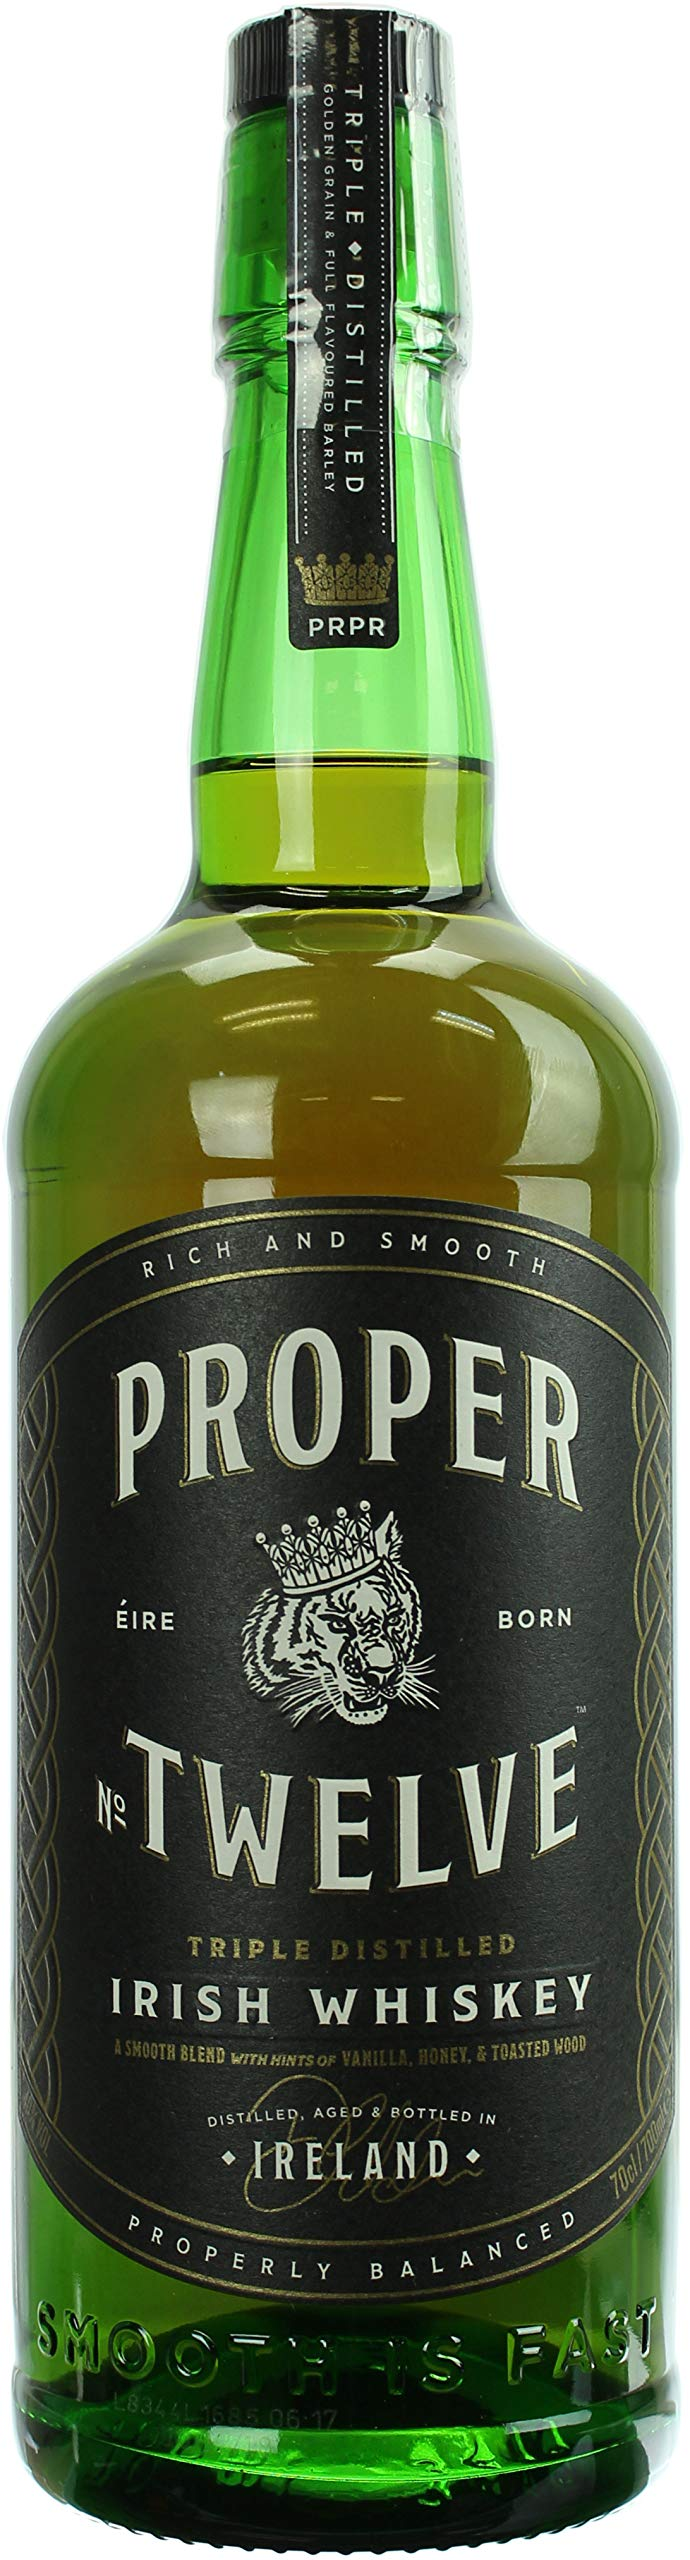 Proper-Number-12-Conor-McGregor-07l